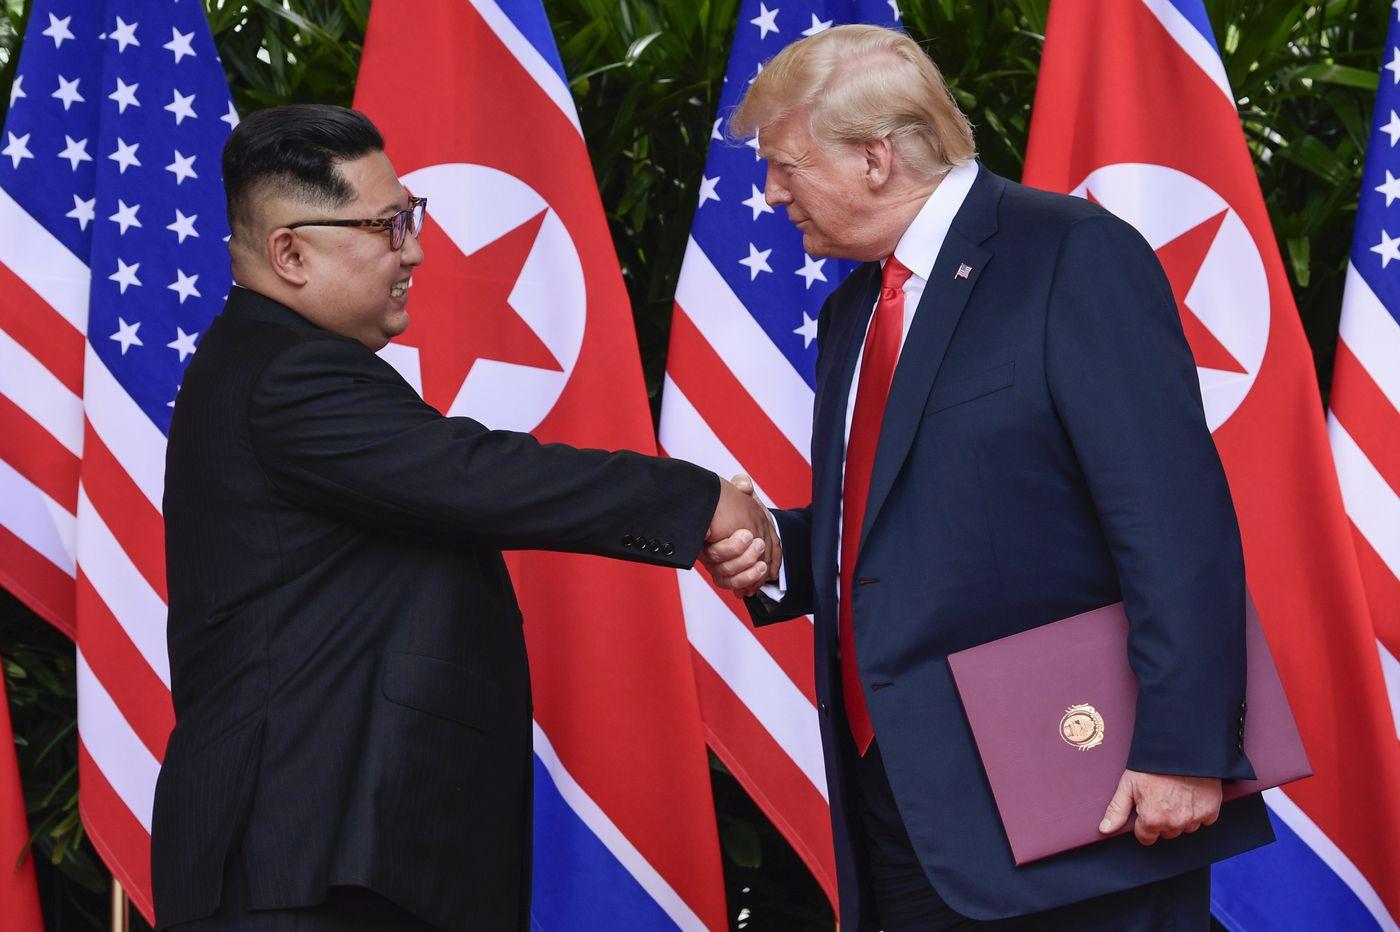 Brendan F. Boyle: Trump weakens America by overlooking North Korean human rights issues | Opinion